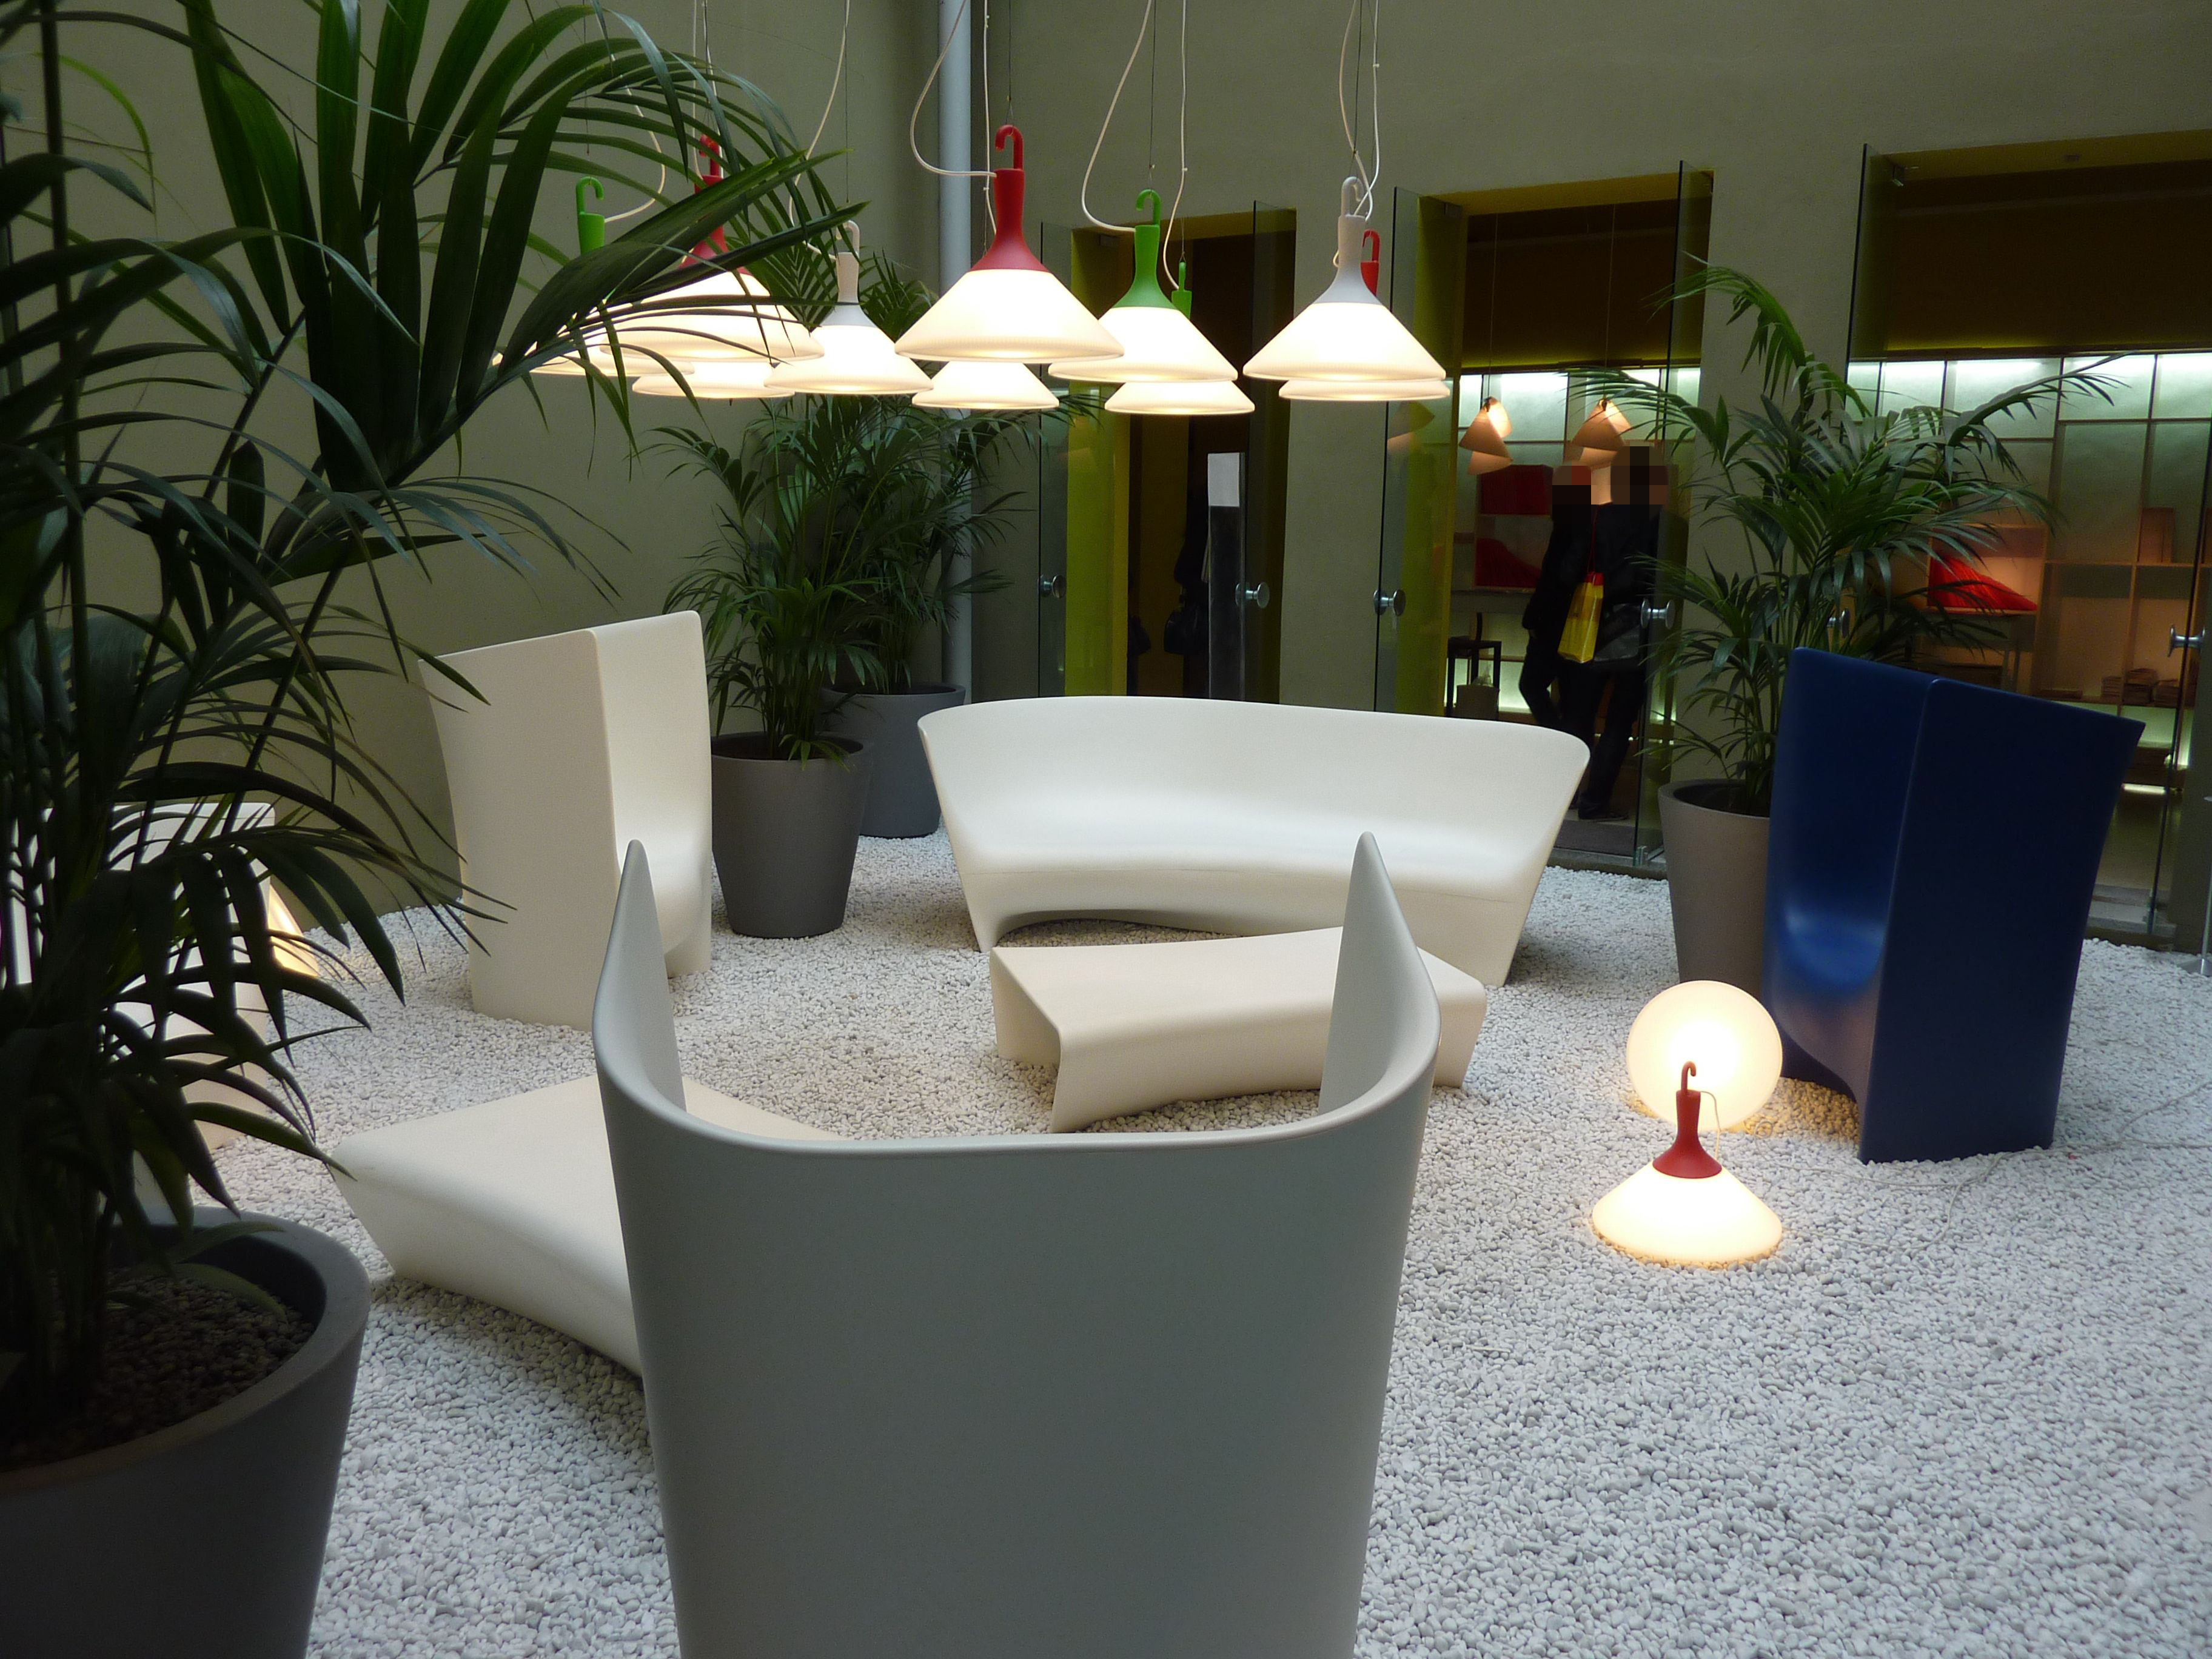 lampe de sol zelight driade blanc vert made in design. Black Bedroom Furniture Sets. Home Design Ideas